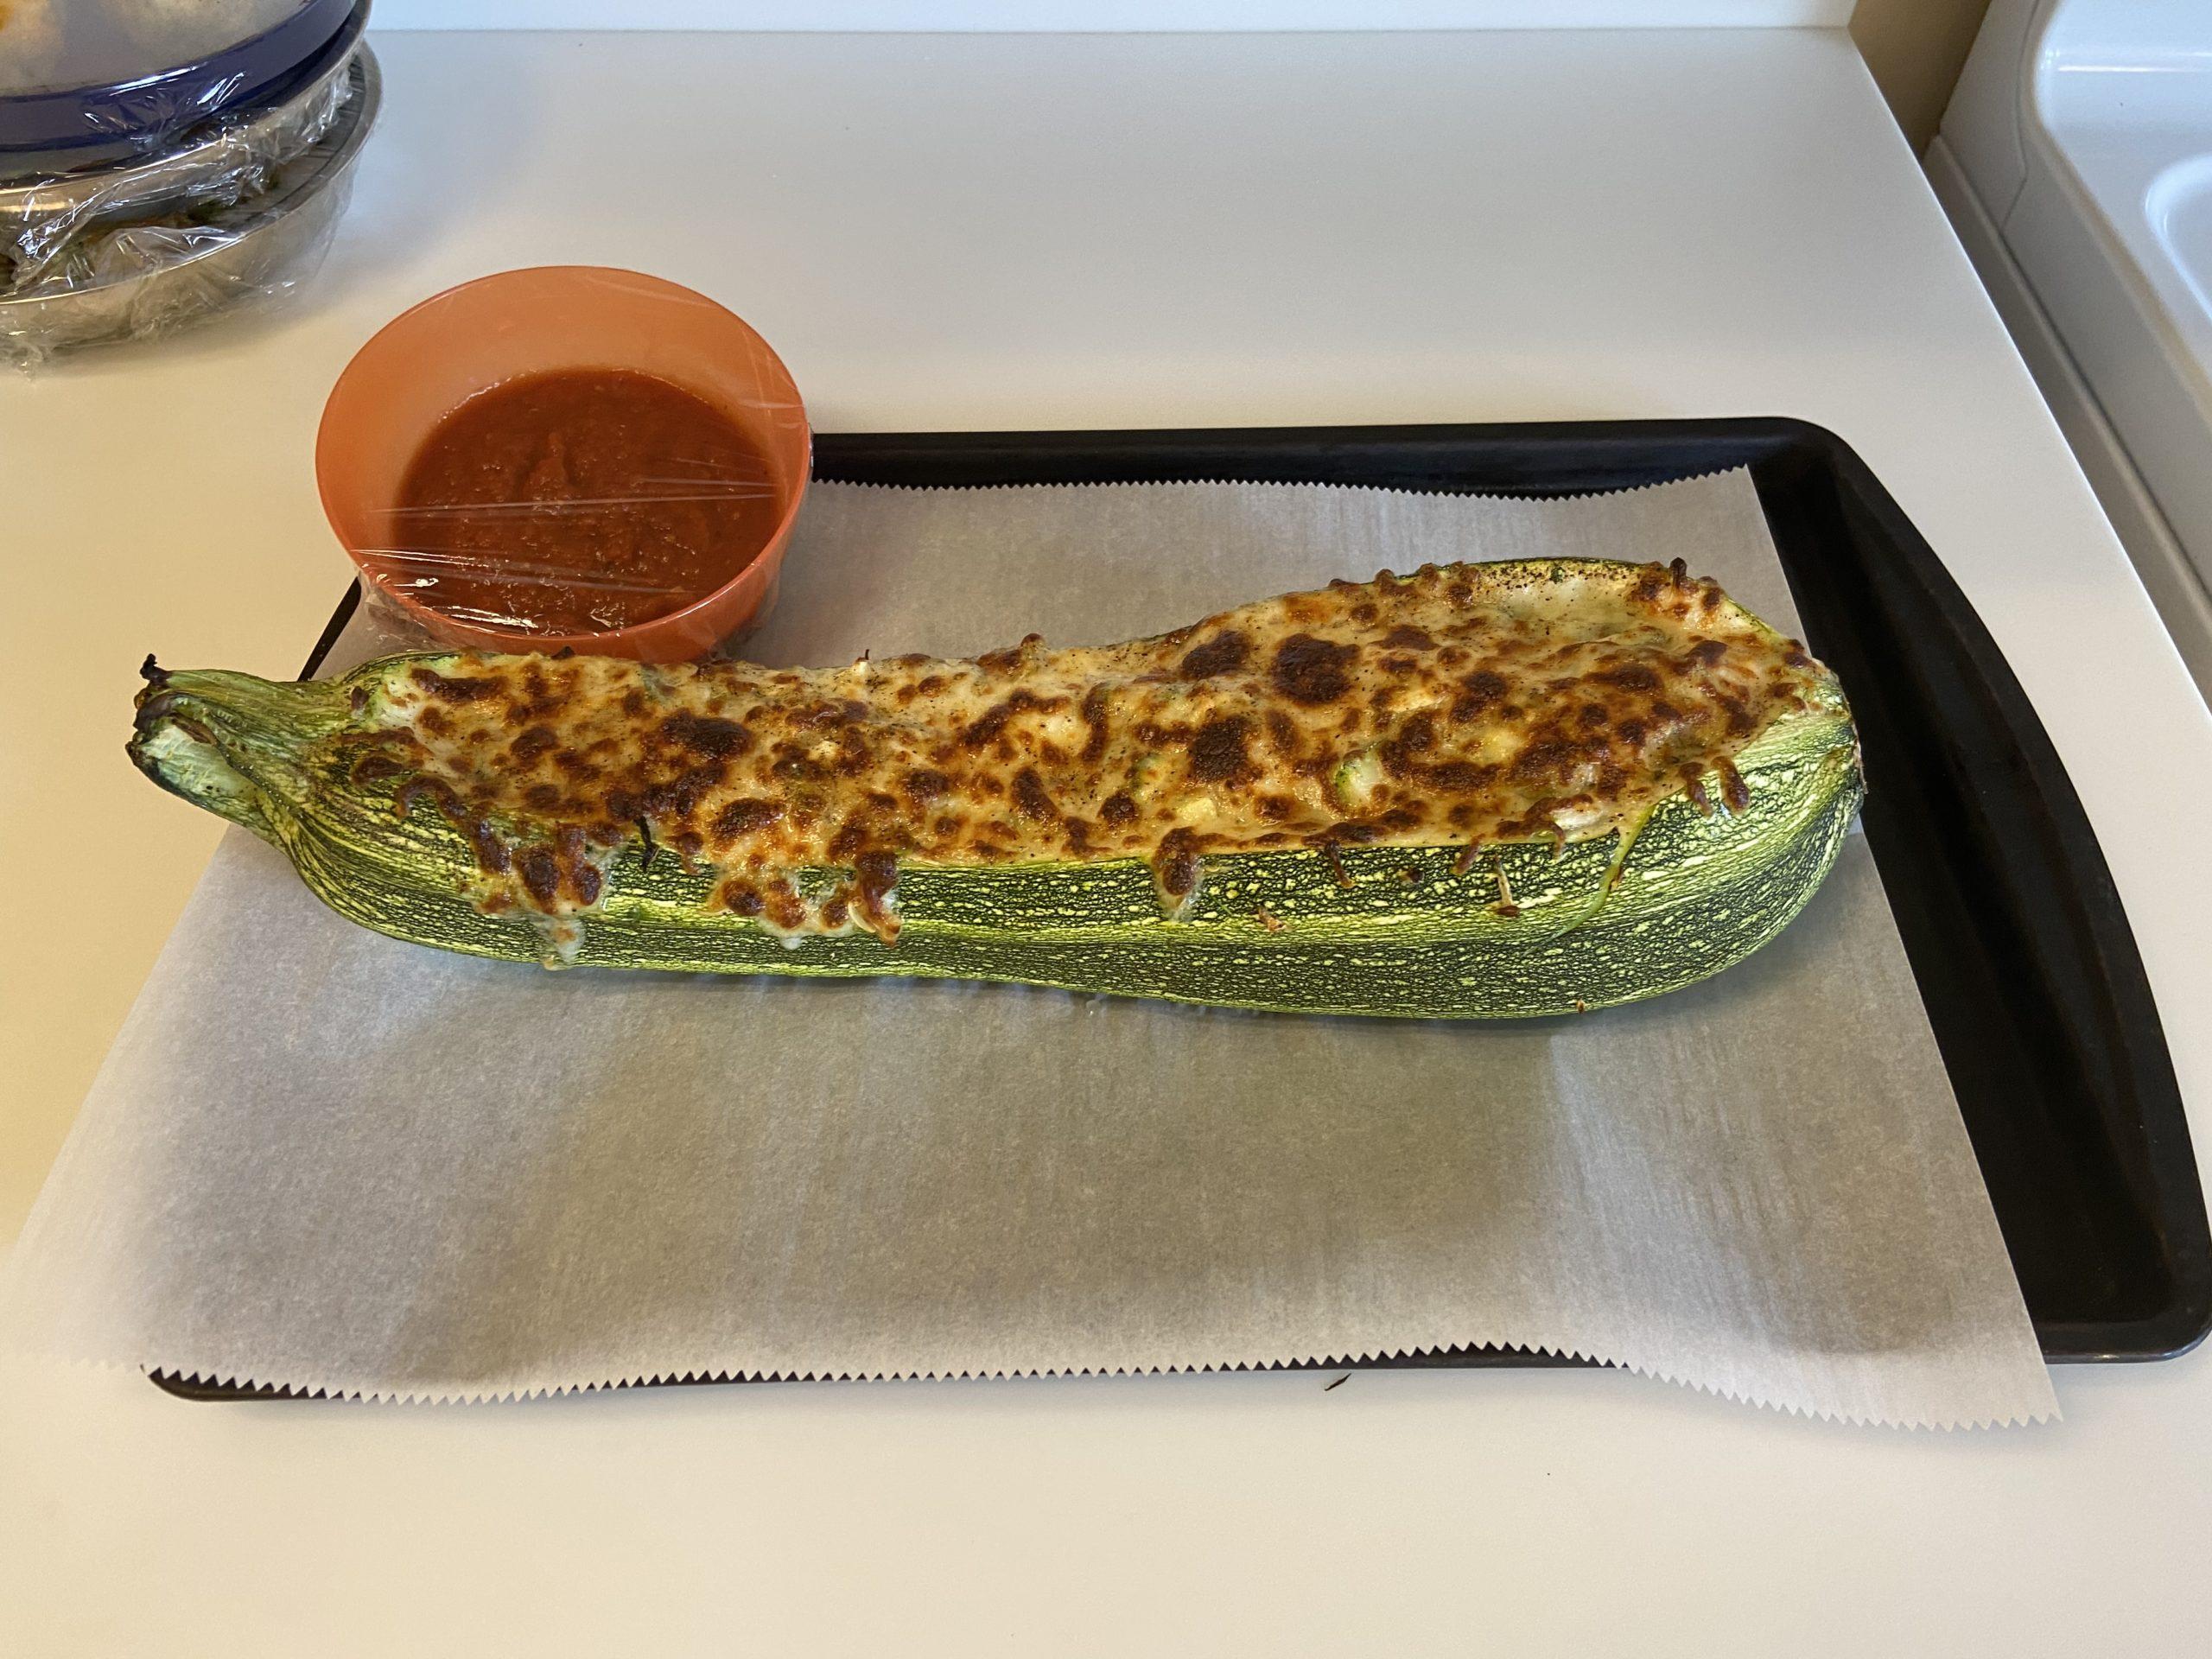 baked zucchini with marinara